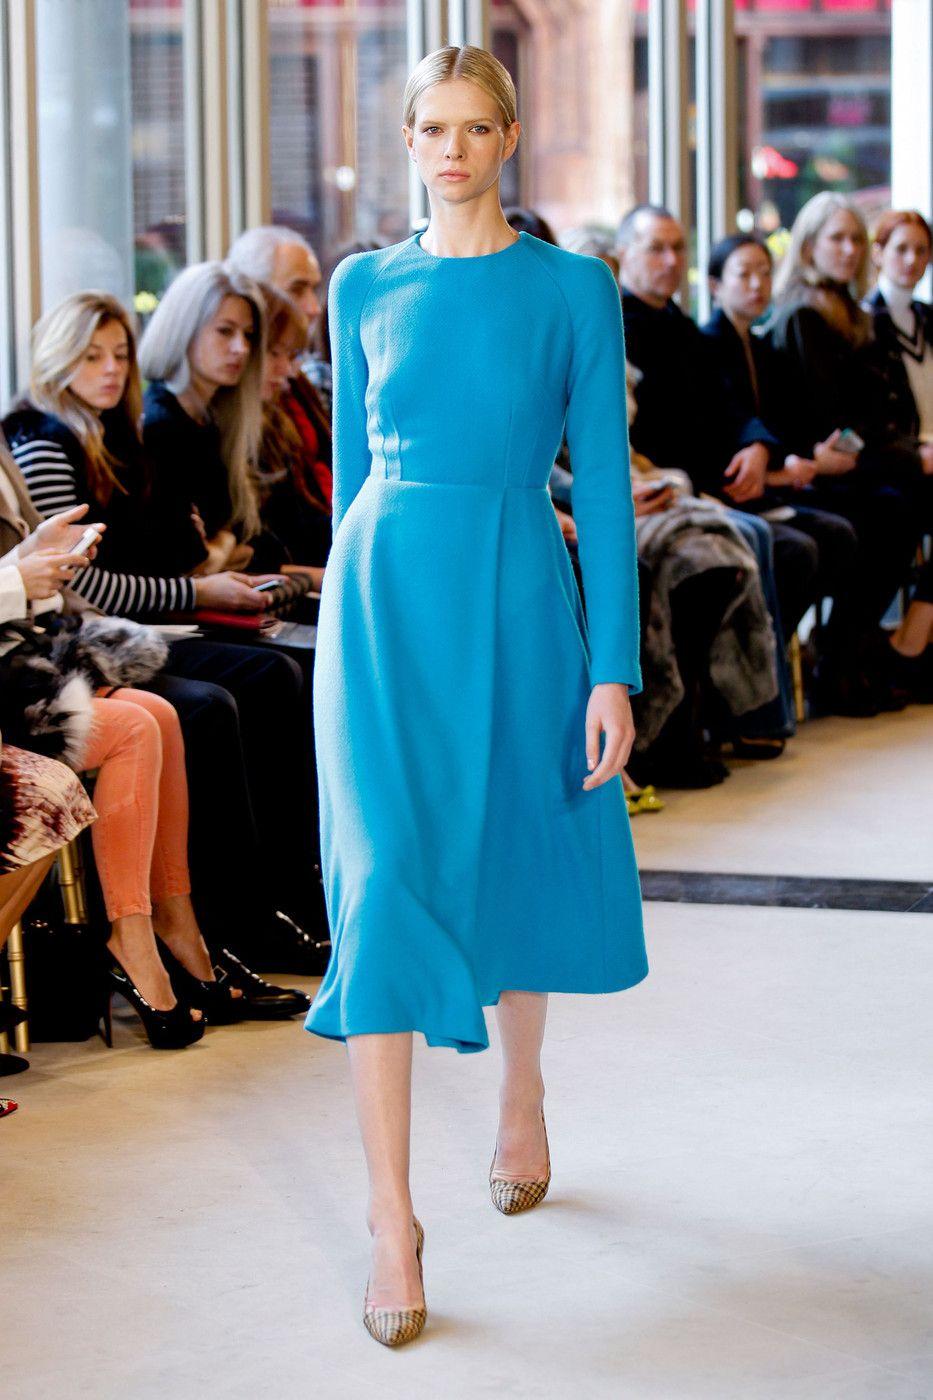 London Fall 2013 - Emilia Wickstead | fashion | Pinterest | Fashion